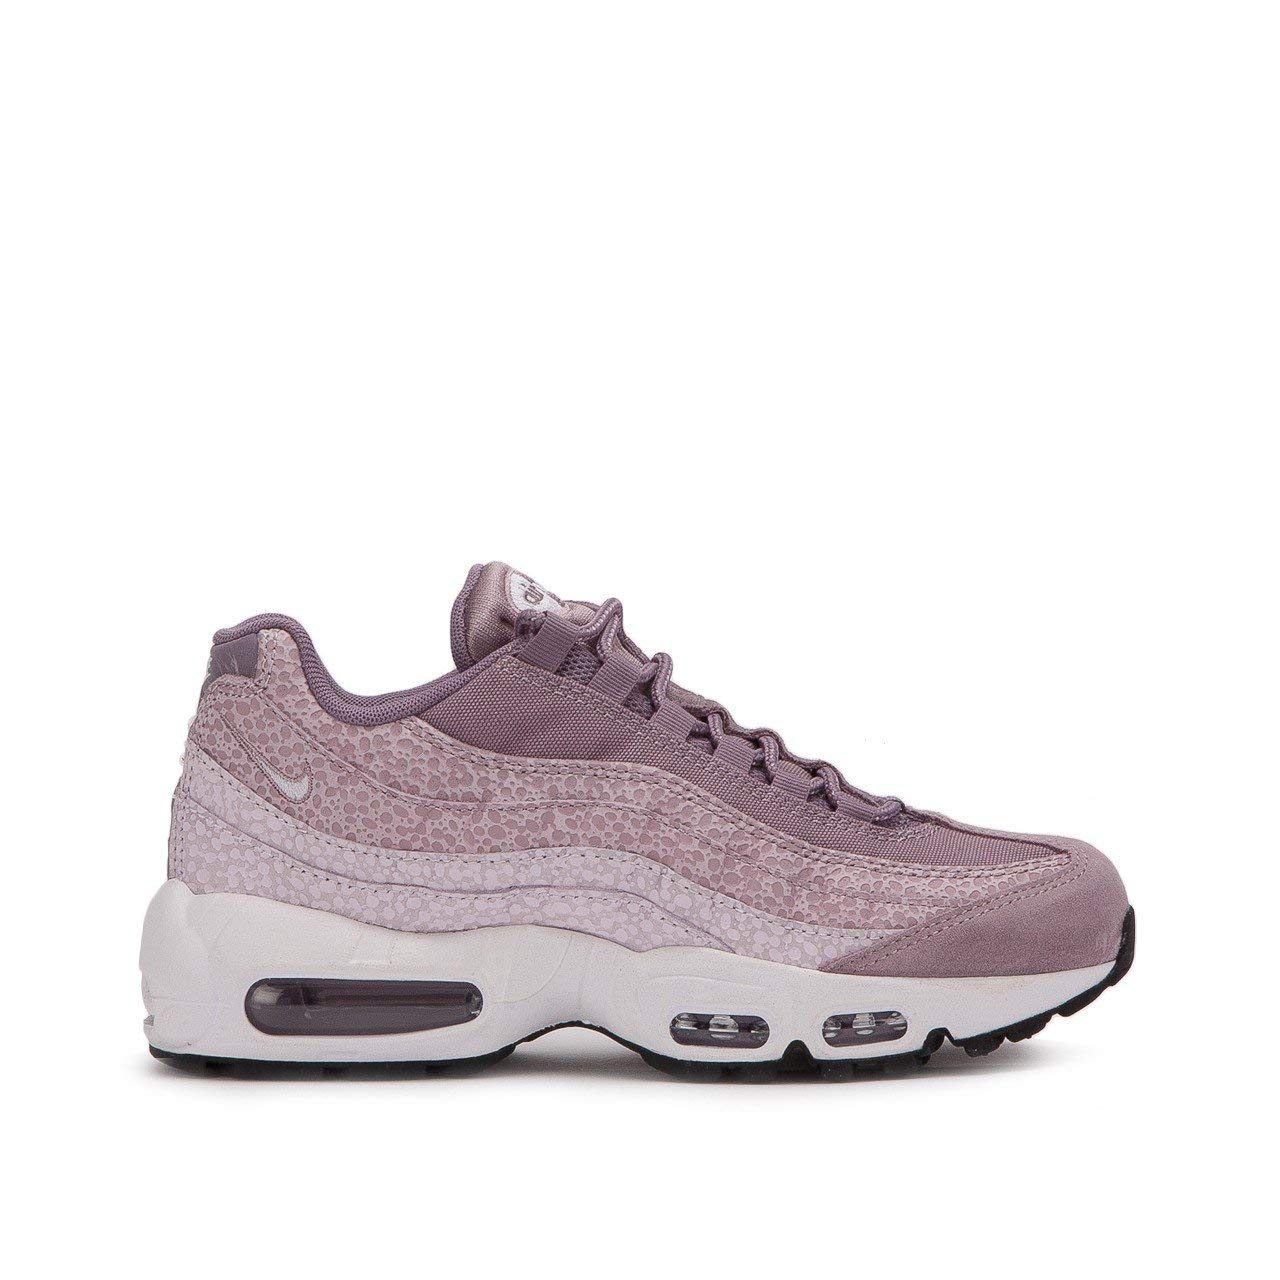 Buy Nike Air Max 95 Womens Purple Smoke White Trainers Store